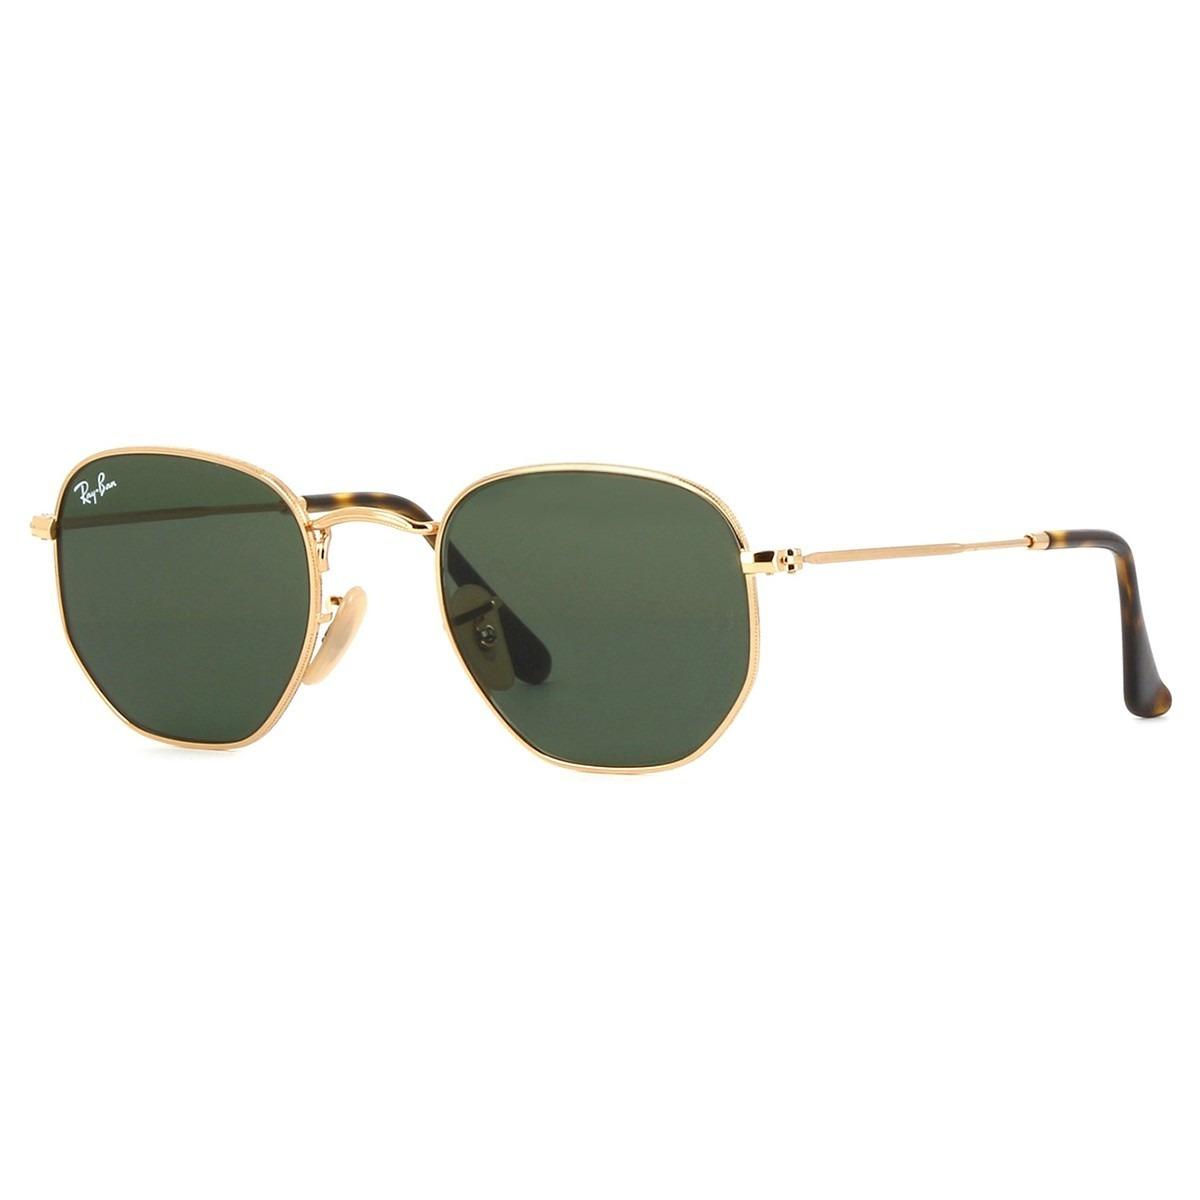 óculos de sol hexagonal feminino - masculino black friday. Carregando zoom. 95883aa78a